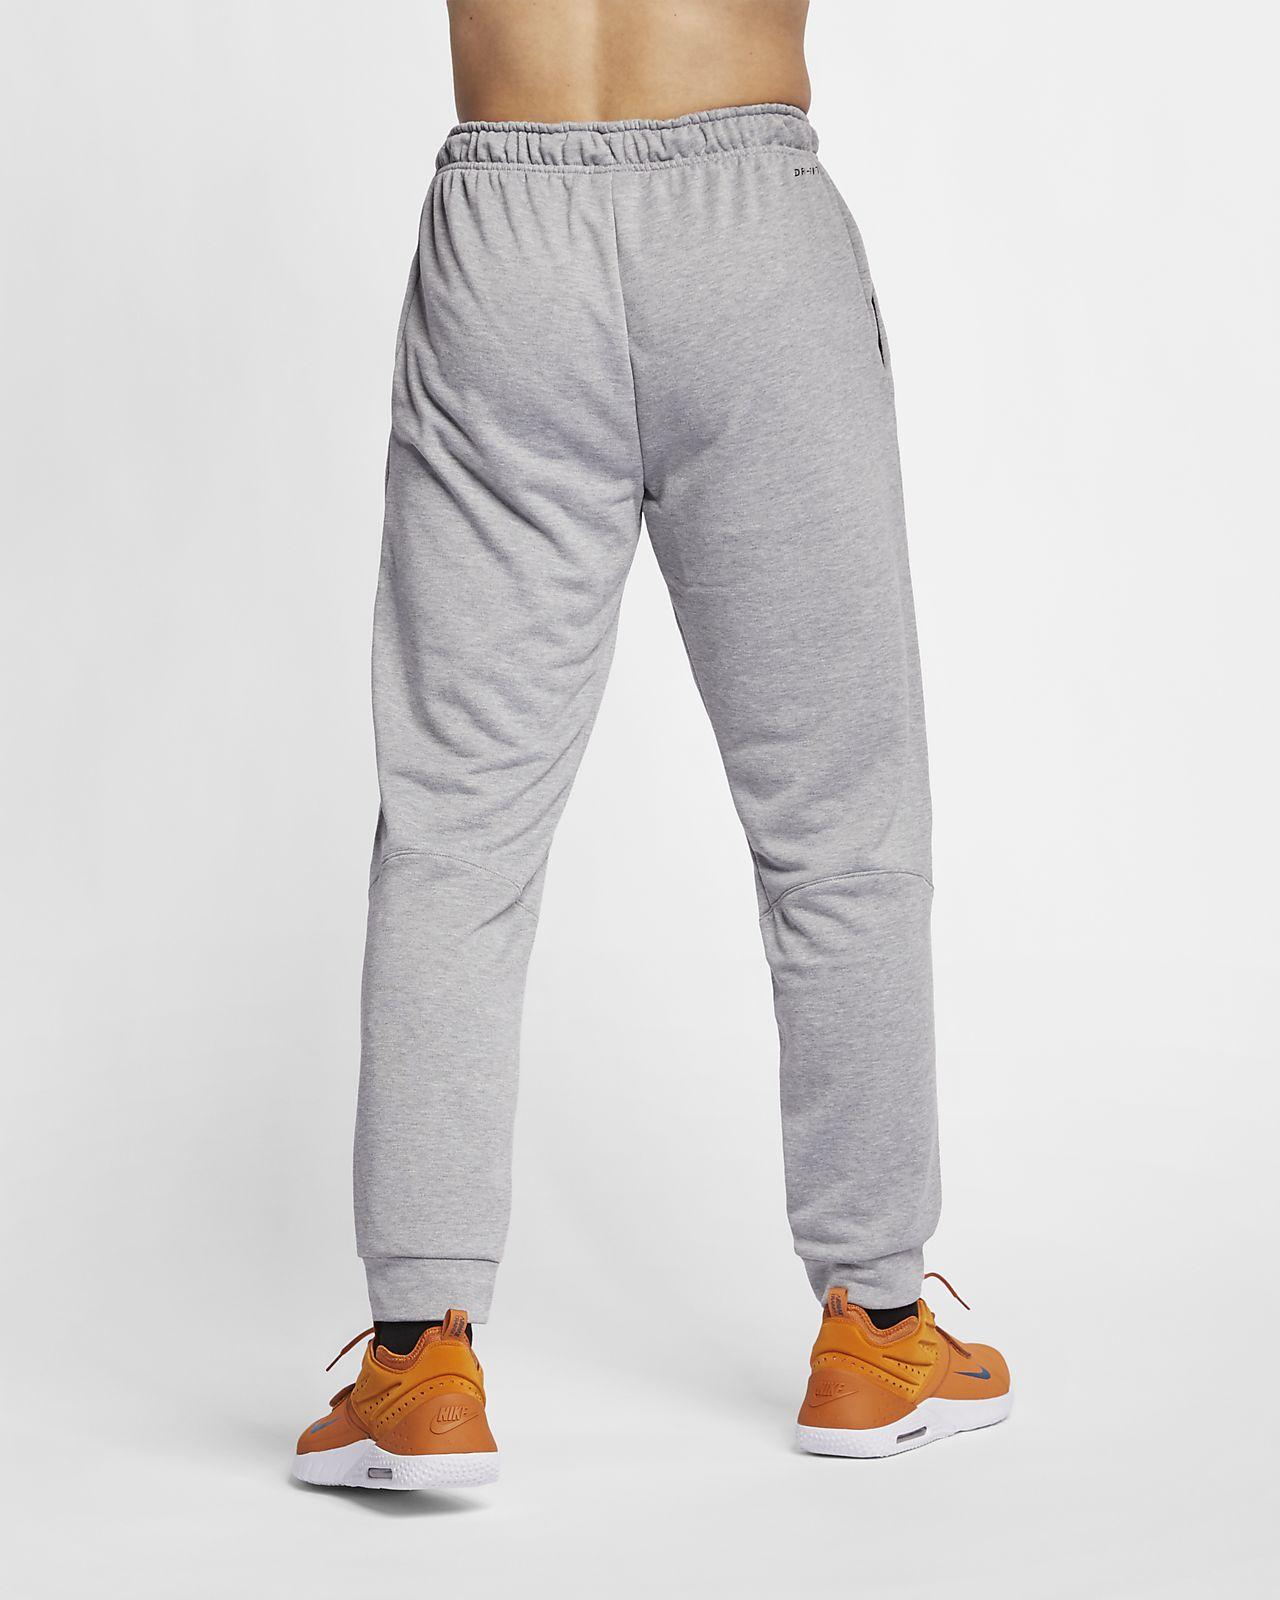 Pánské zúžené tréninkové kalhoty Nike Dri-FIT z flísu. Nike.com CZ bcb8756282